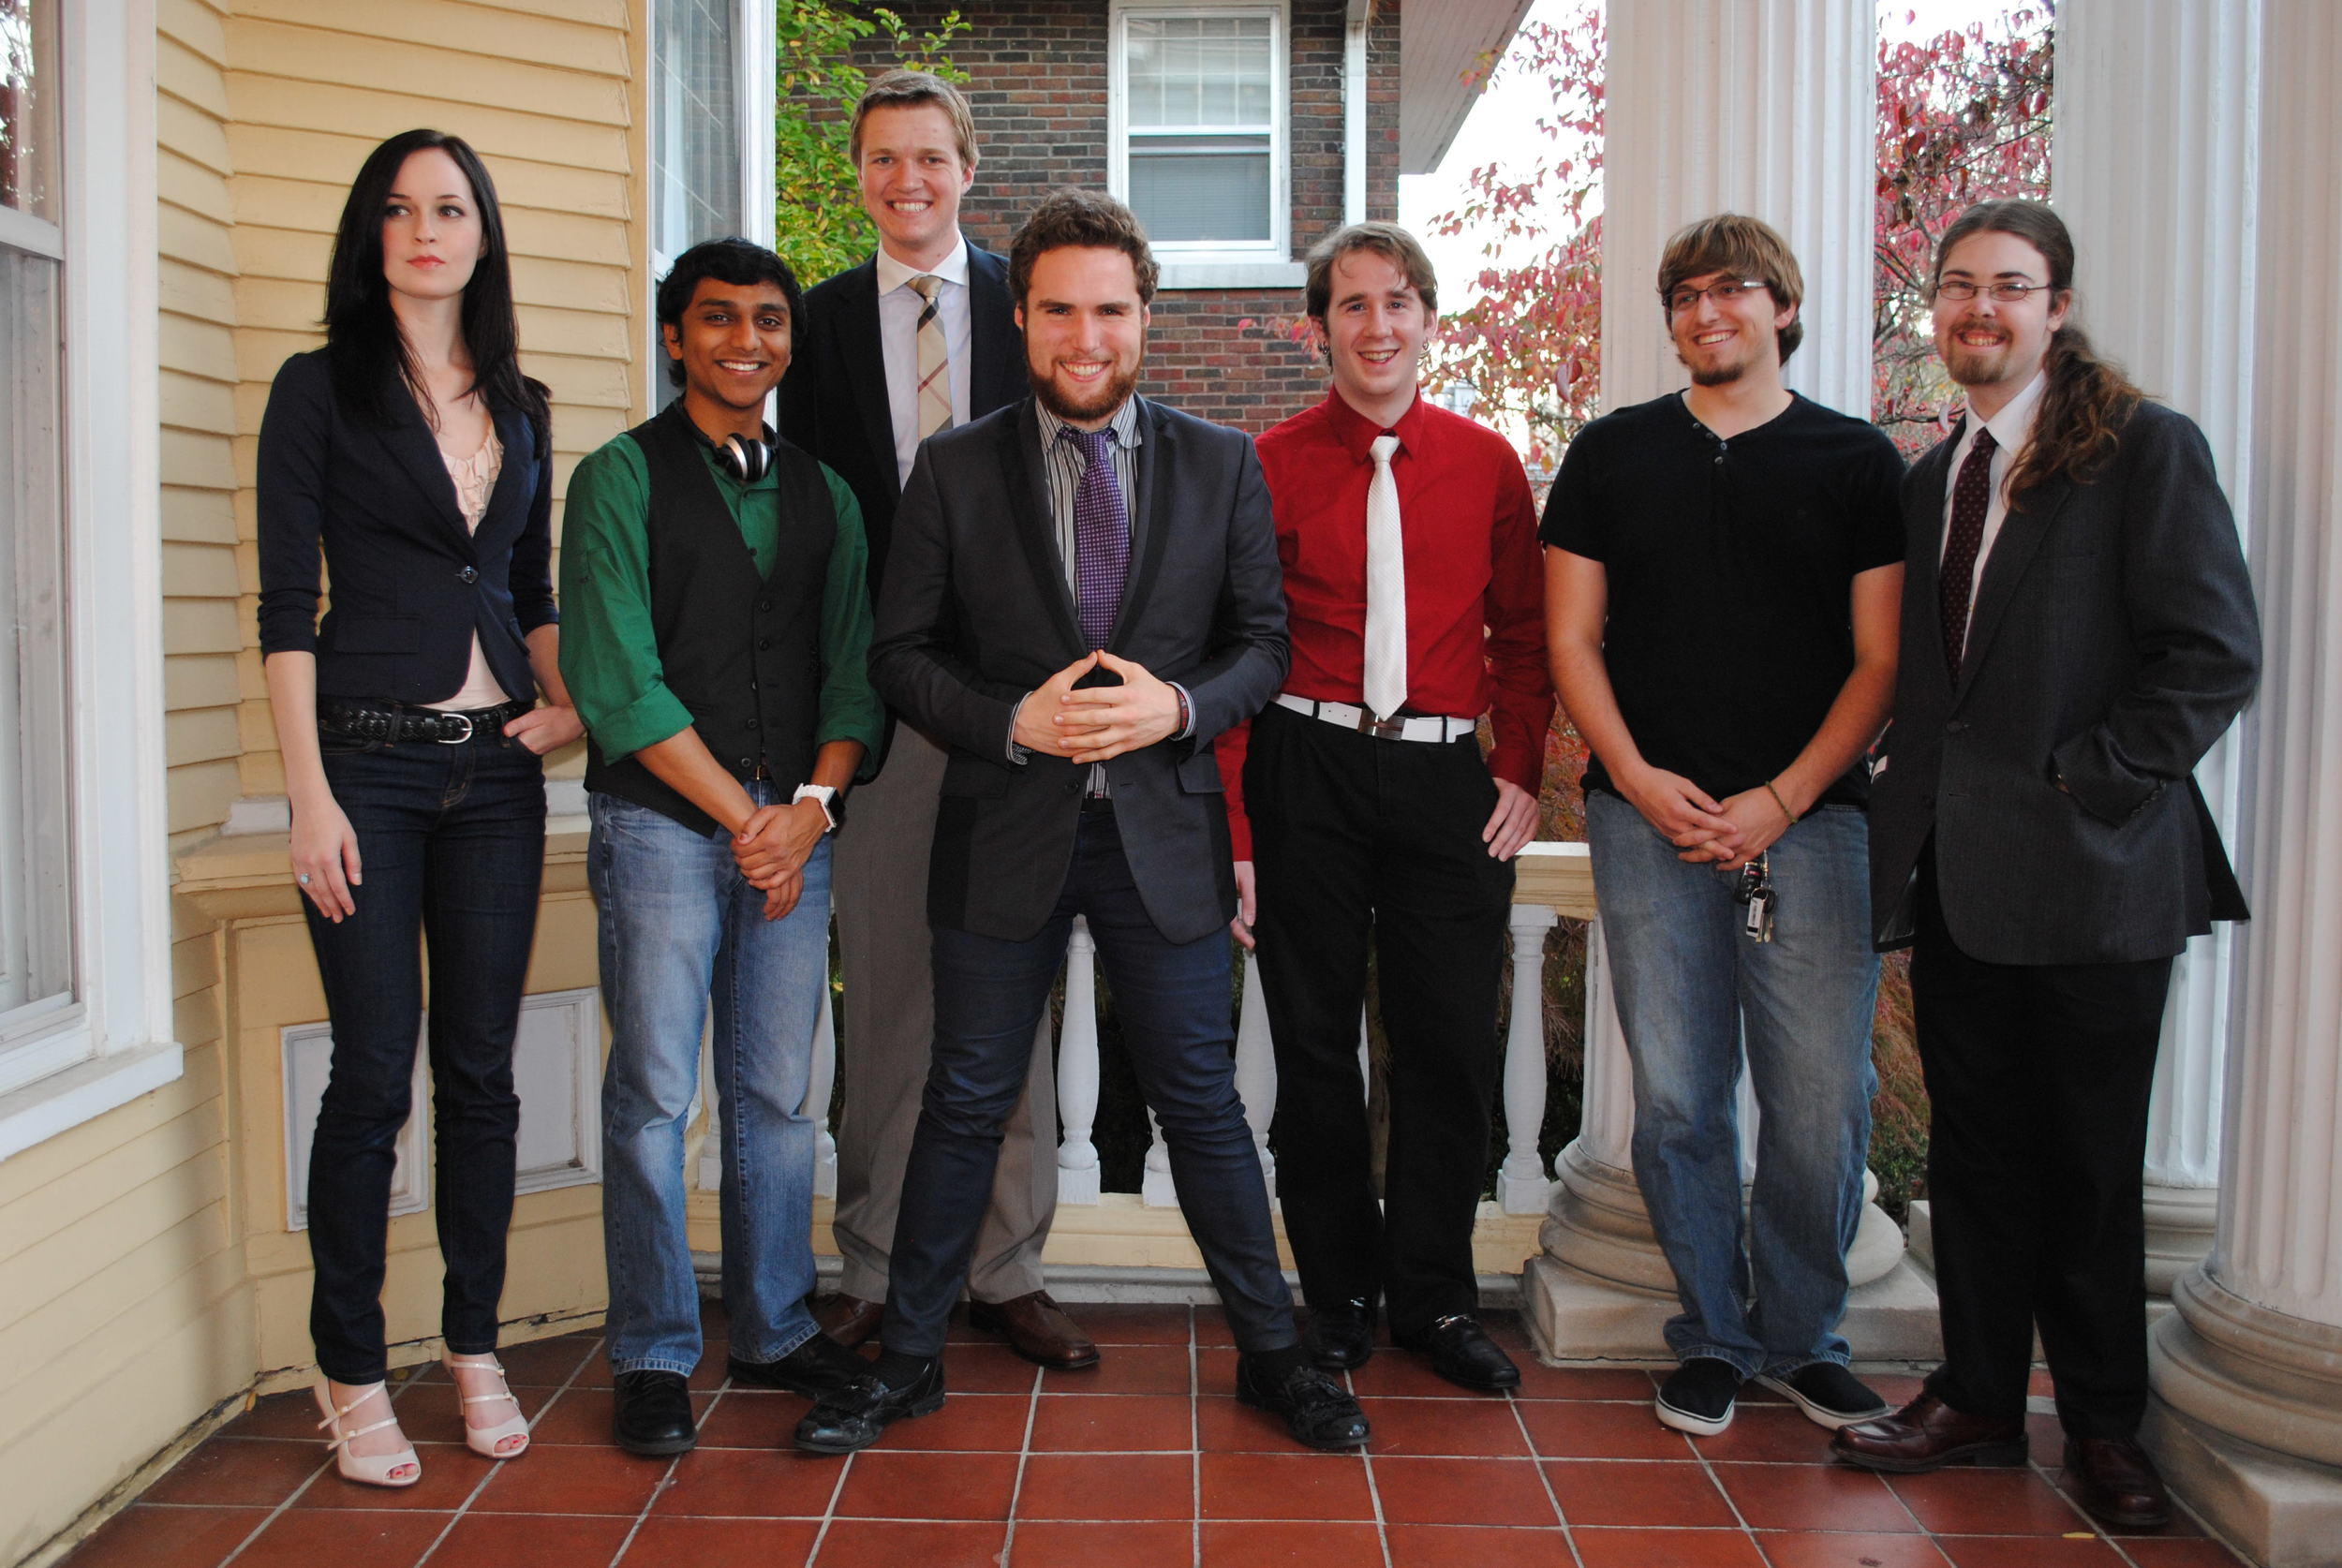 Members of the Holon Publishing Team.